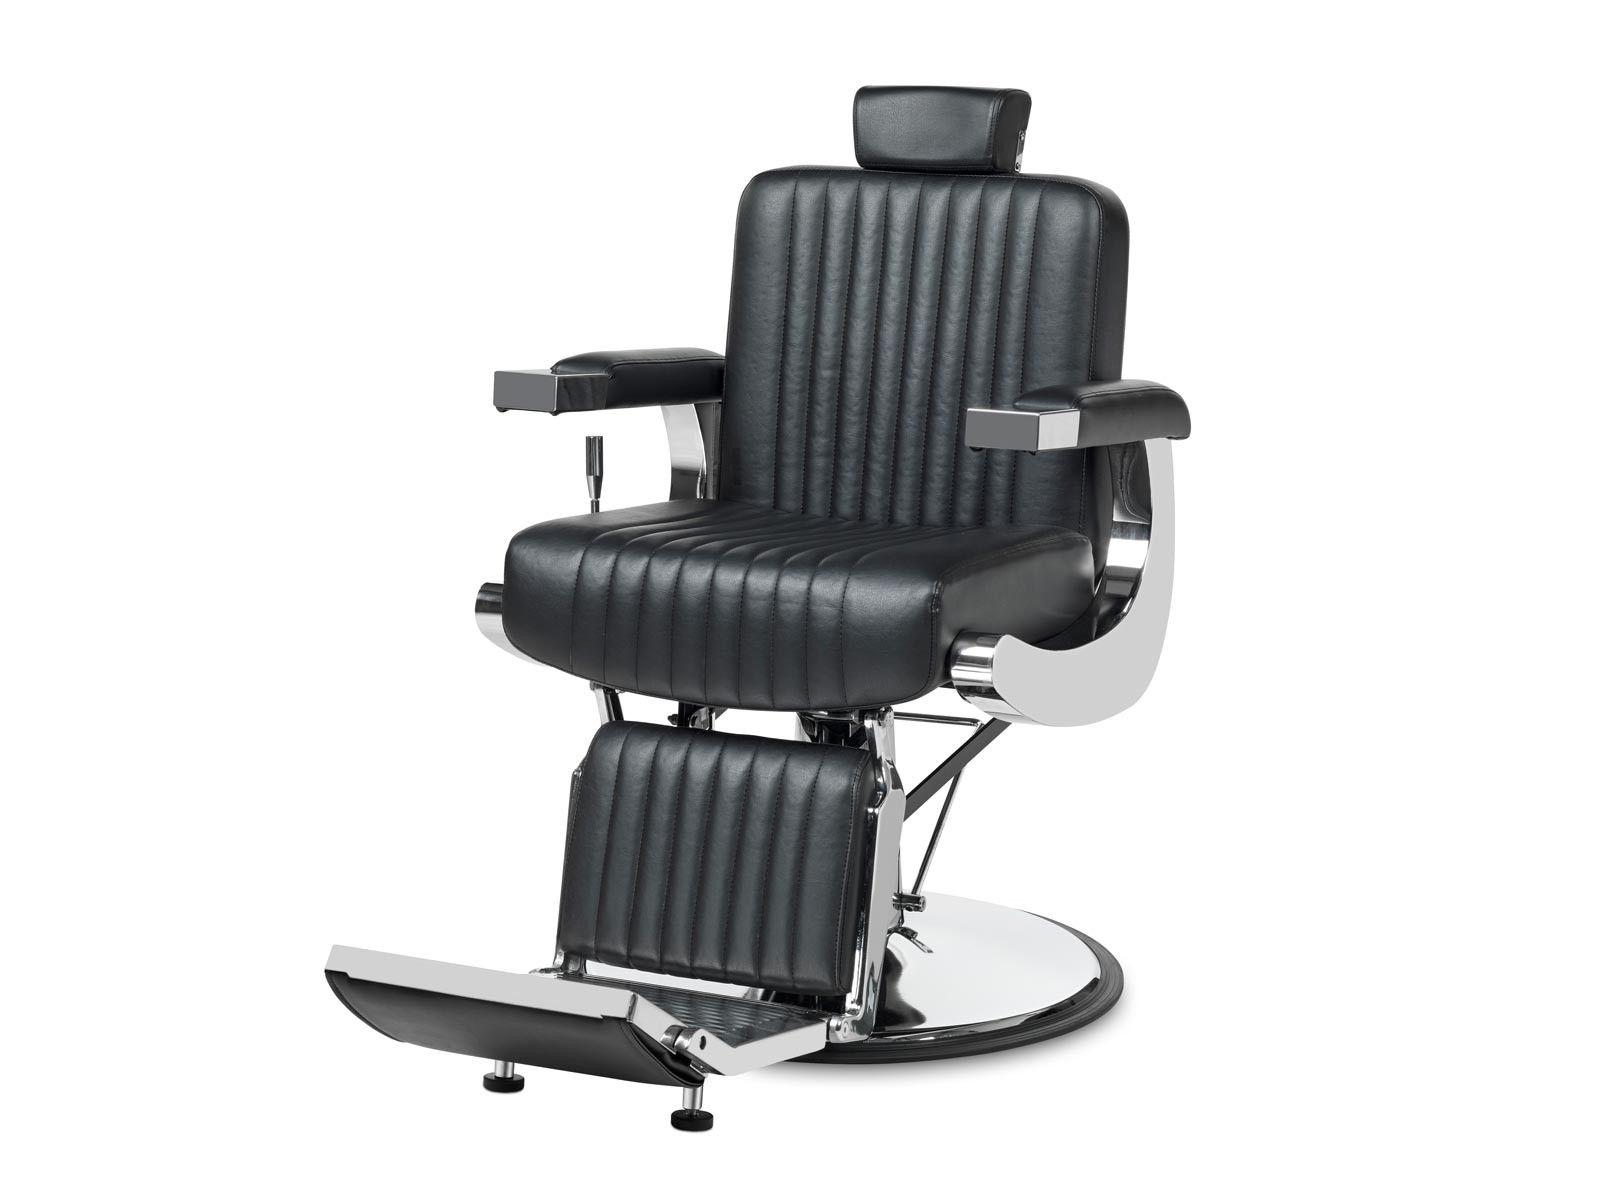 Marke Neue Friseur Stuhle Retro Salon Mobel Mini Barber Chair Barbier Versorgt Fur Den Verkauf Lila Friseur Stuhl Stuhle Barber Chair Chair Style Chair